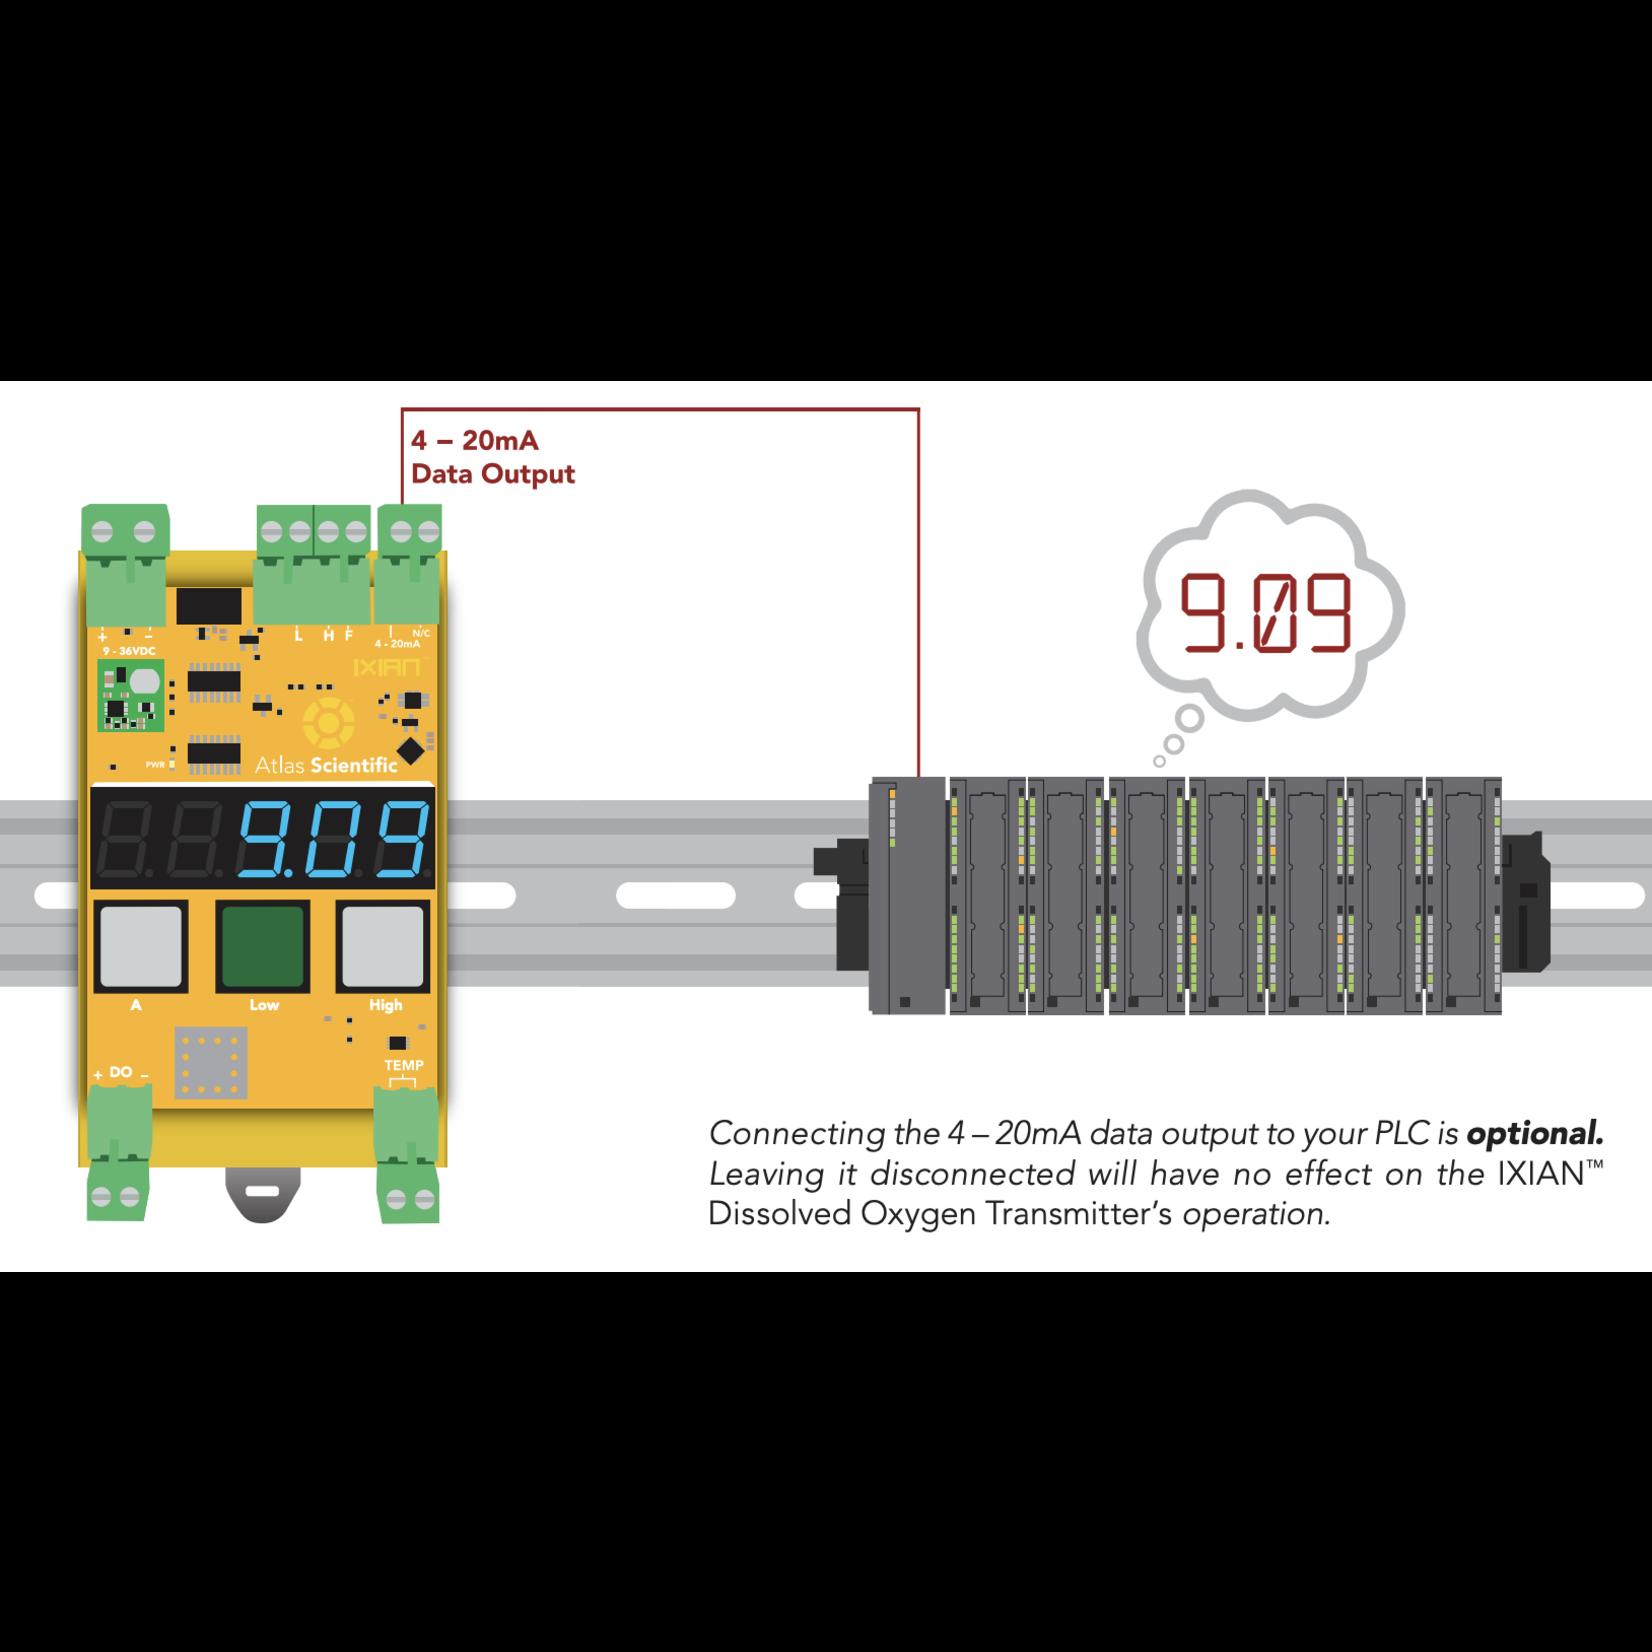 Atlas Scientific IXIAN™ Dissolved Oxygen Transmitter